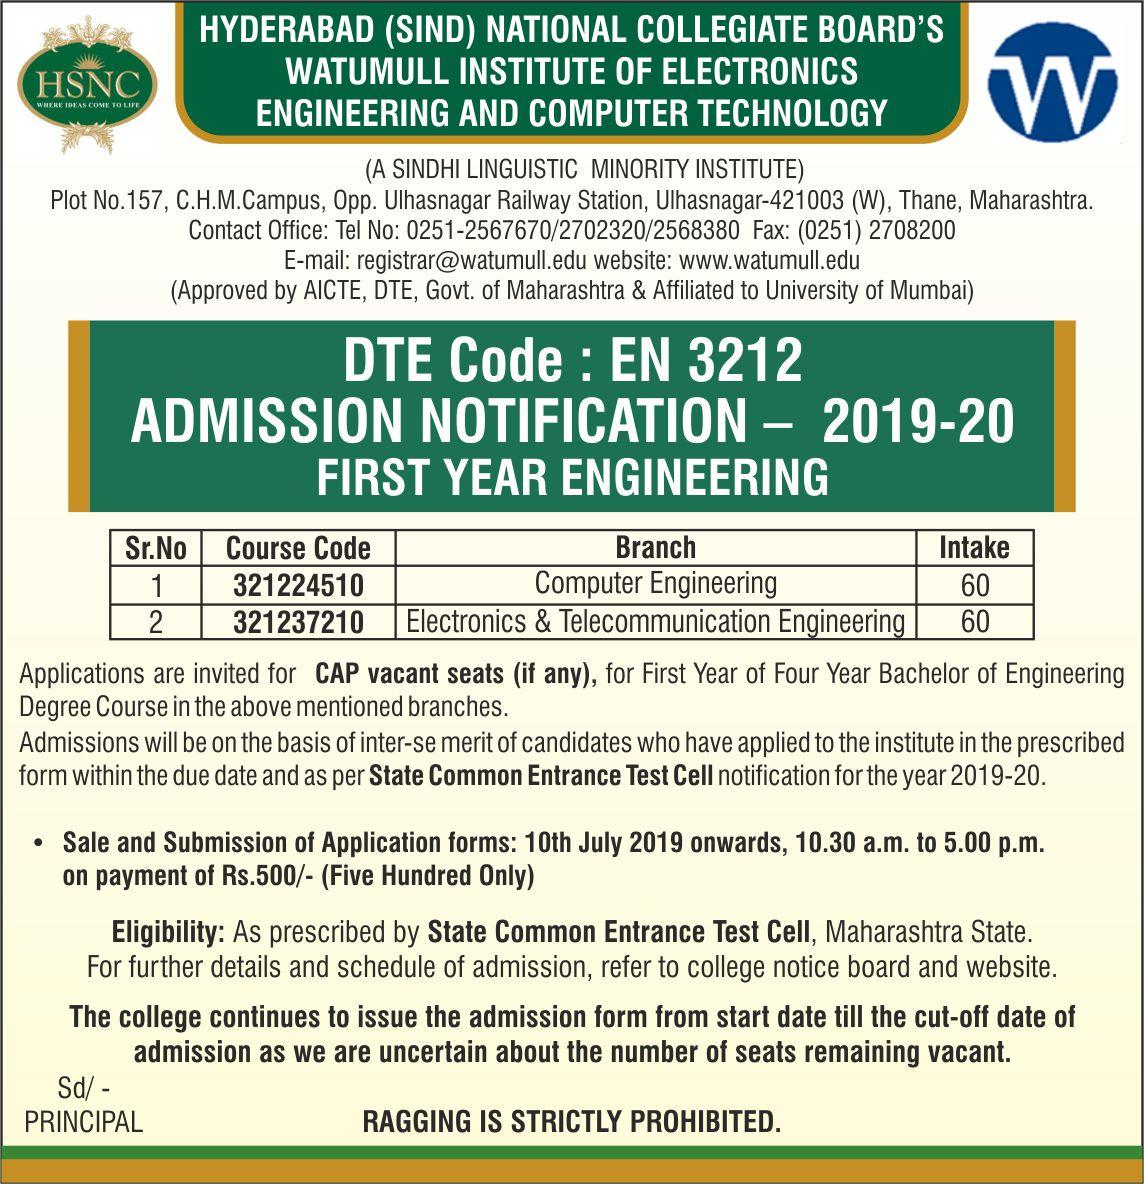 Watumull Institute of Electronics Engineering & Computer